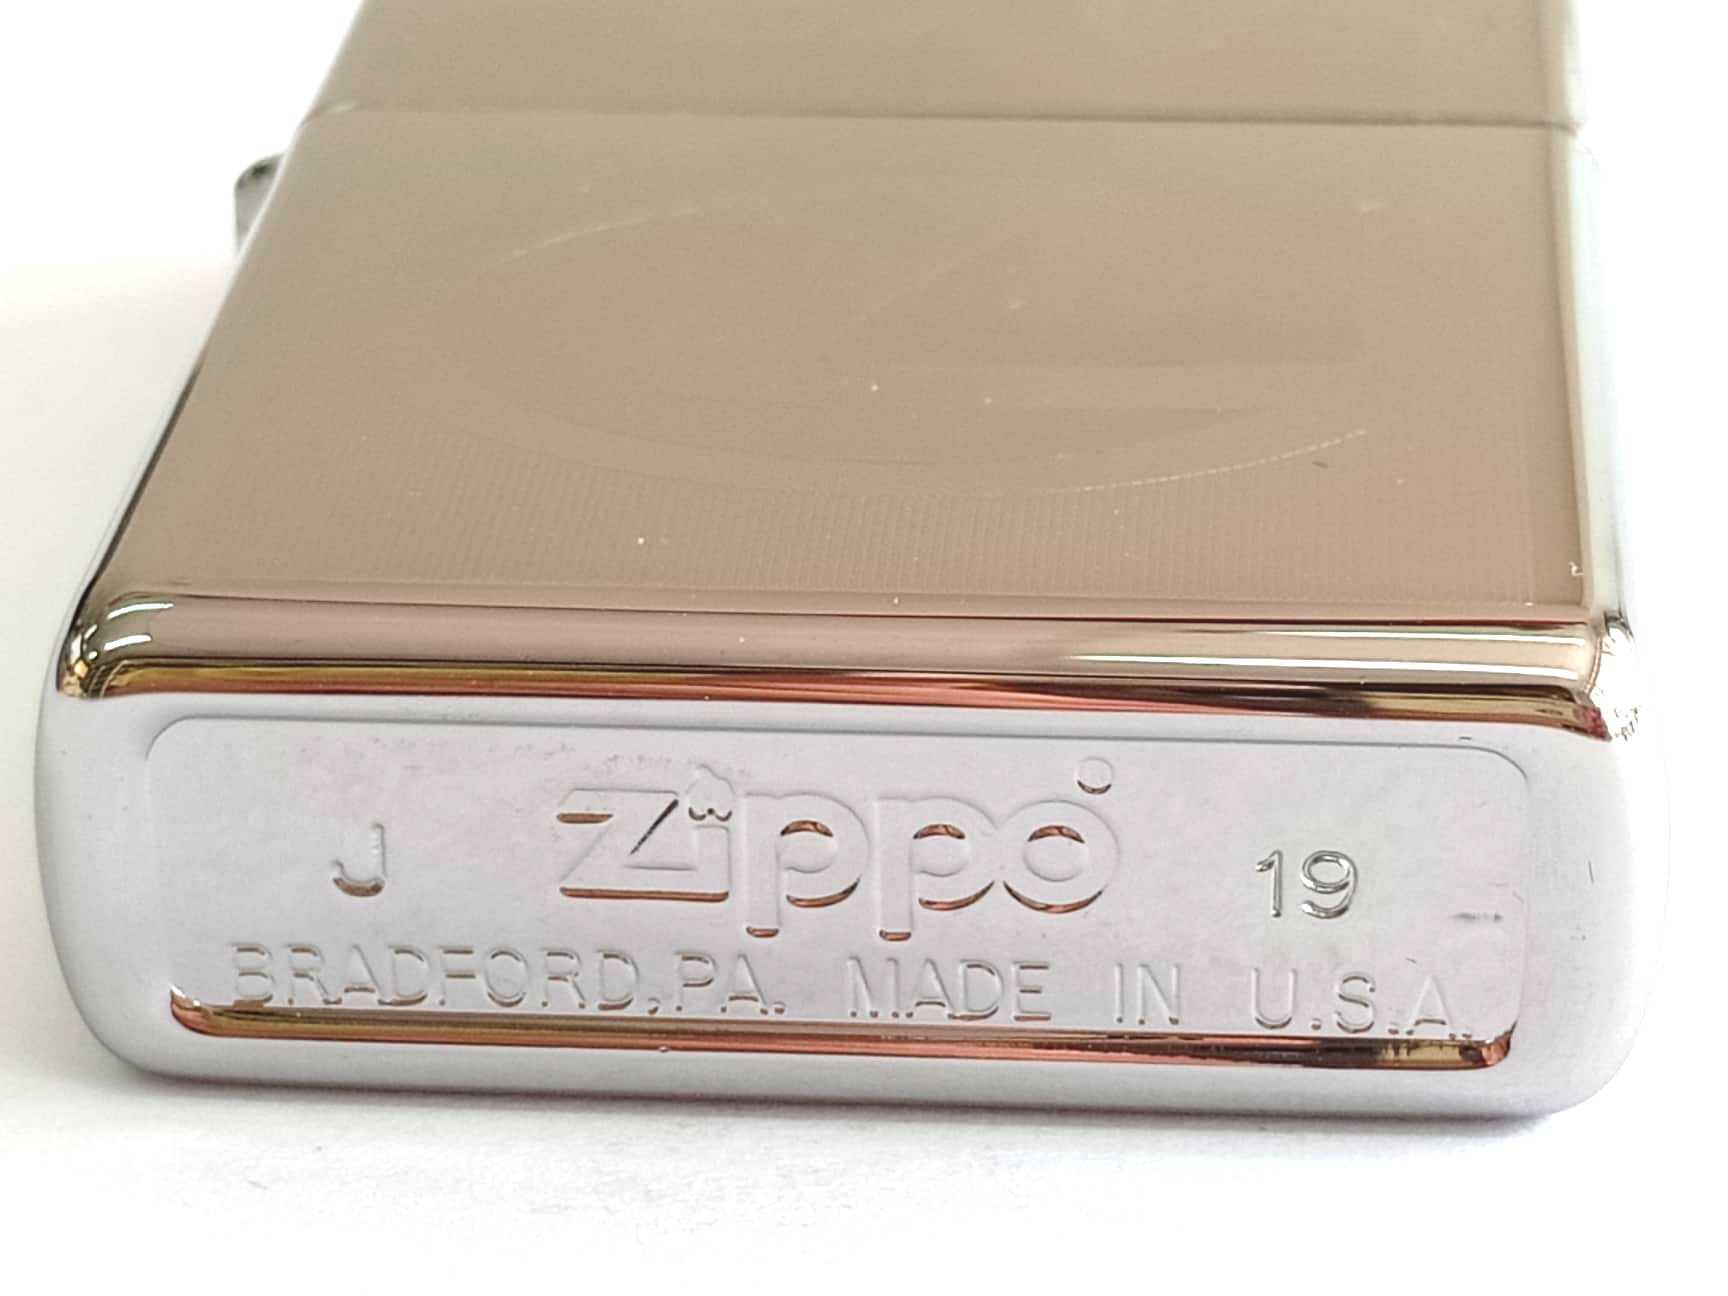 Zippo bong trang khac 1 mat Lexus Z850 3